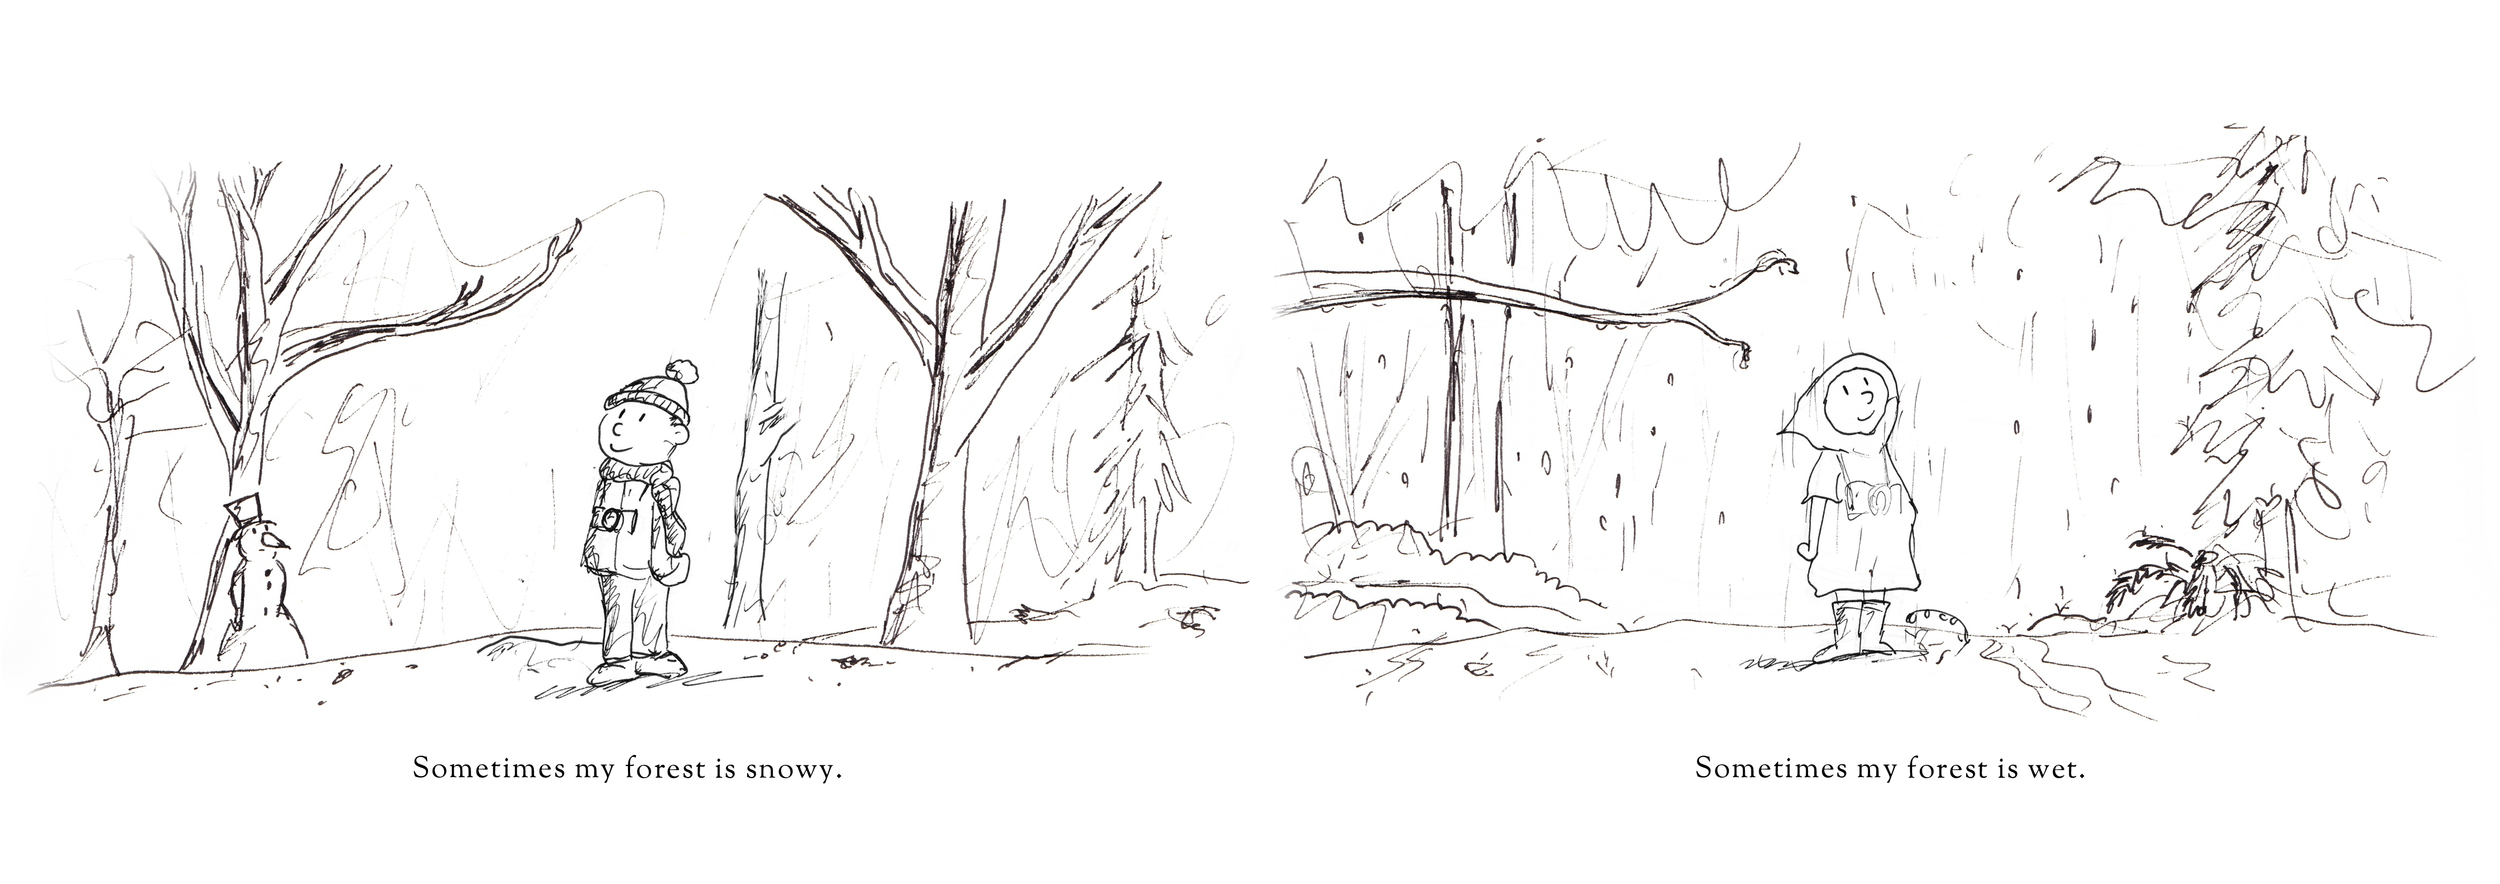 My-Forest_pp-09.jpg